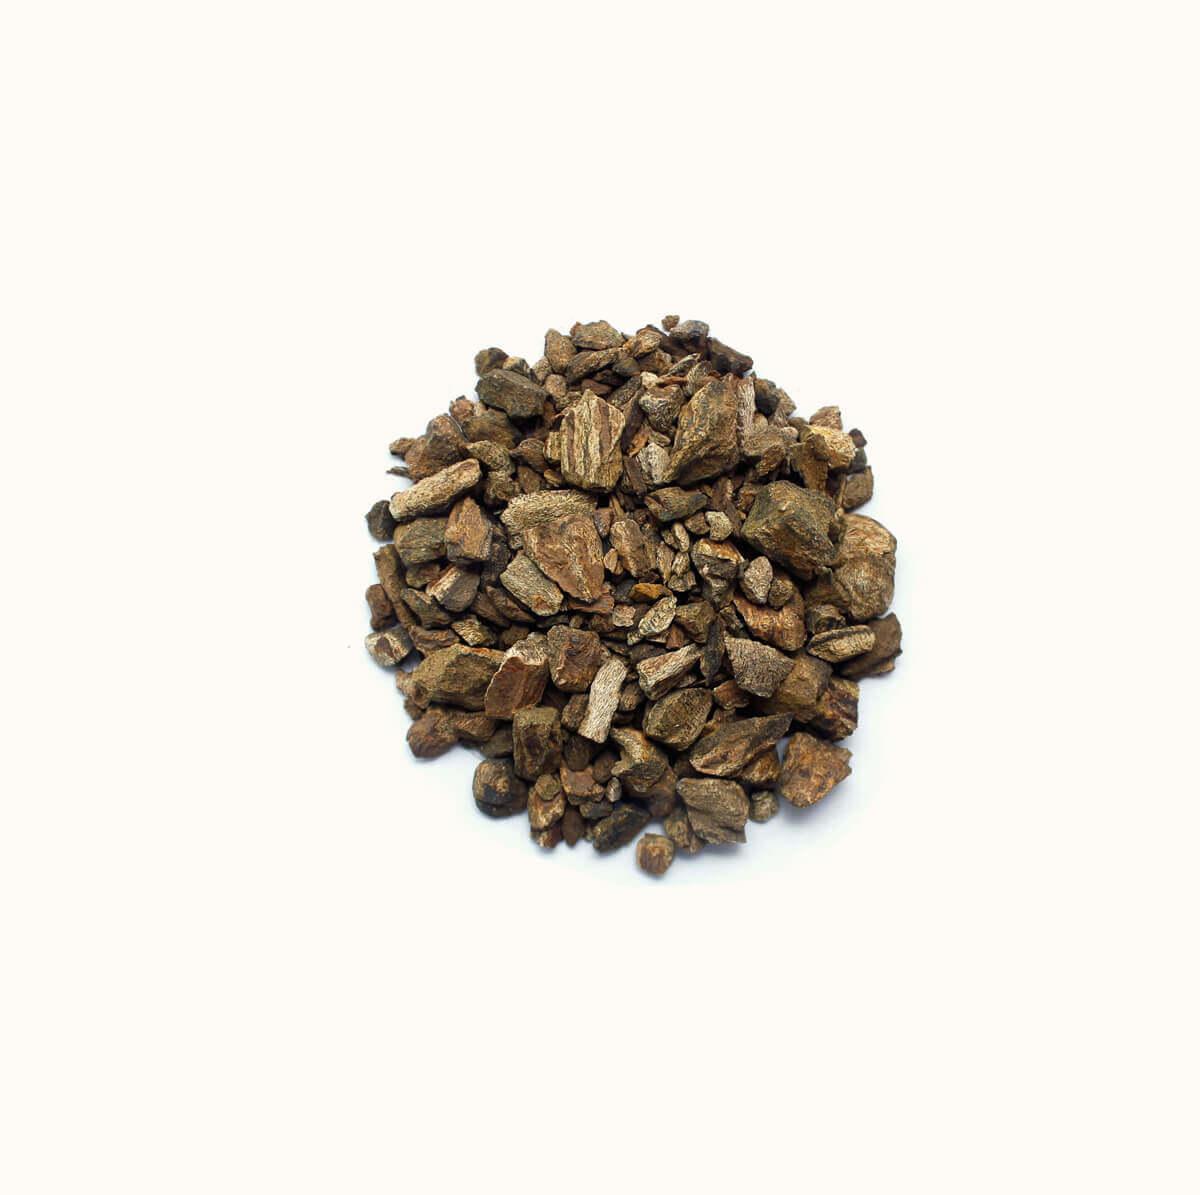 RUIBARBO - Rheum palmatum - 30g